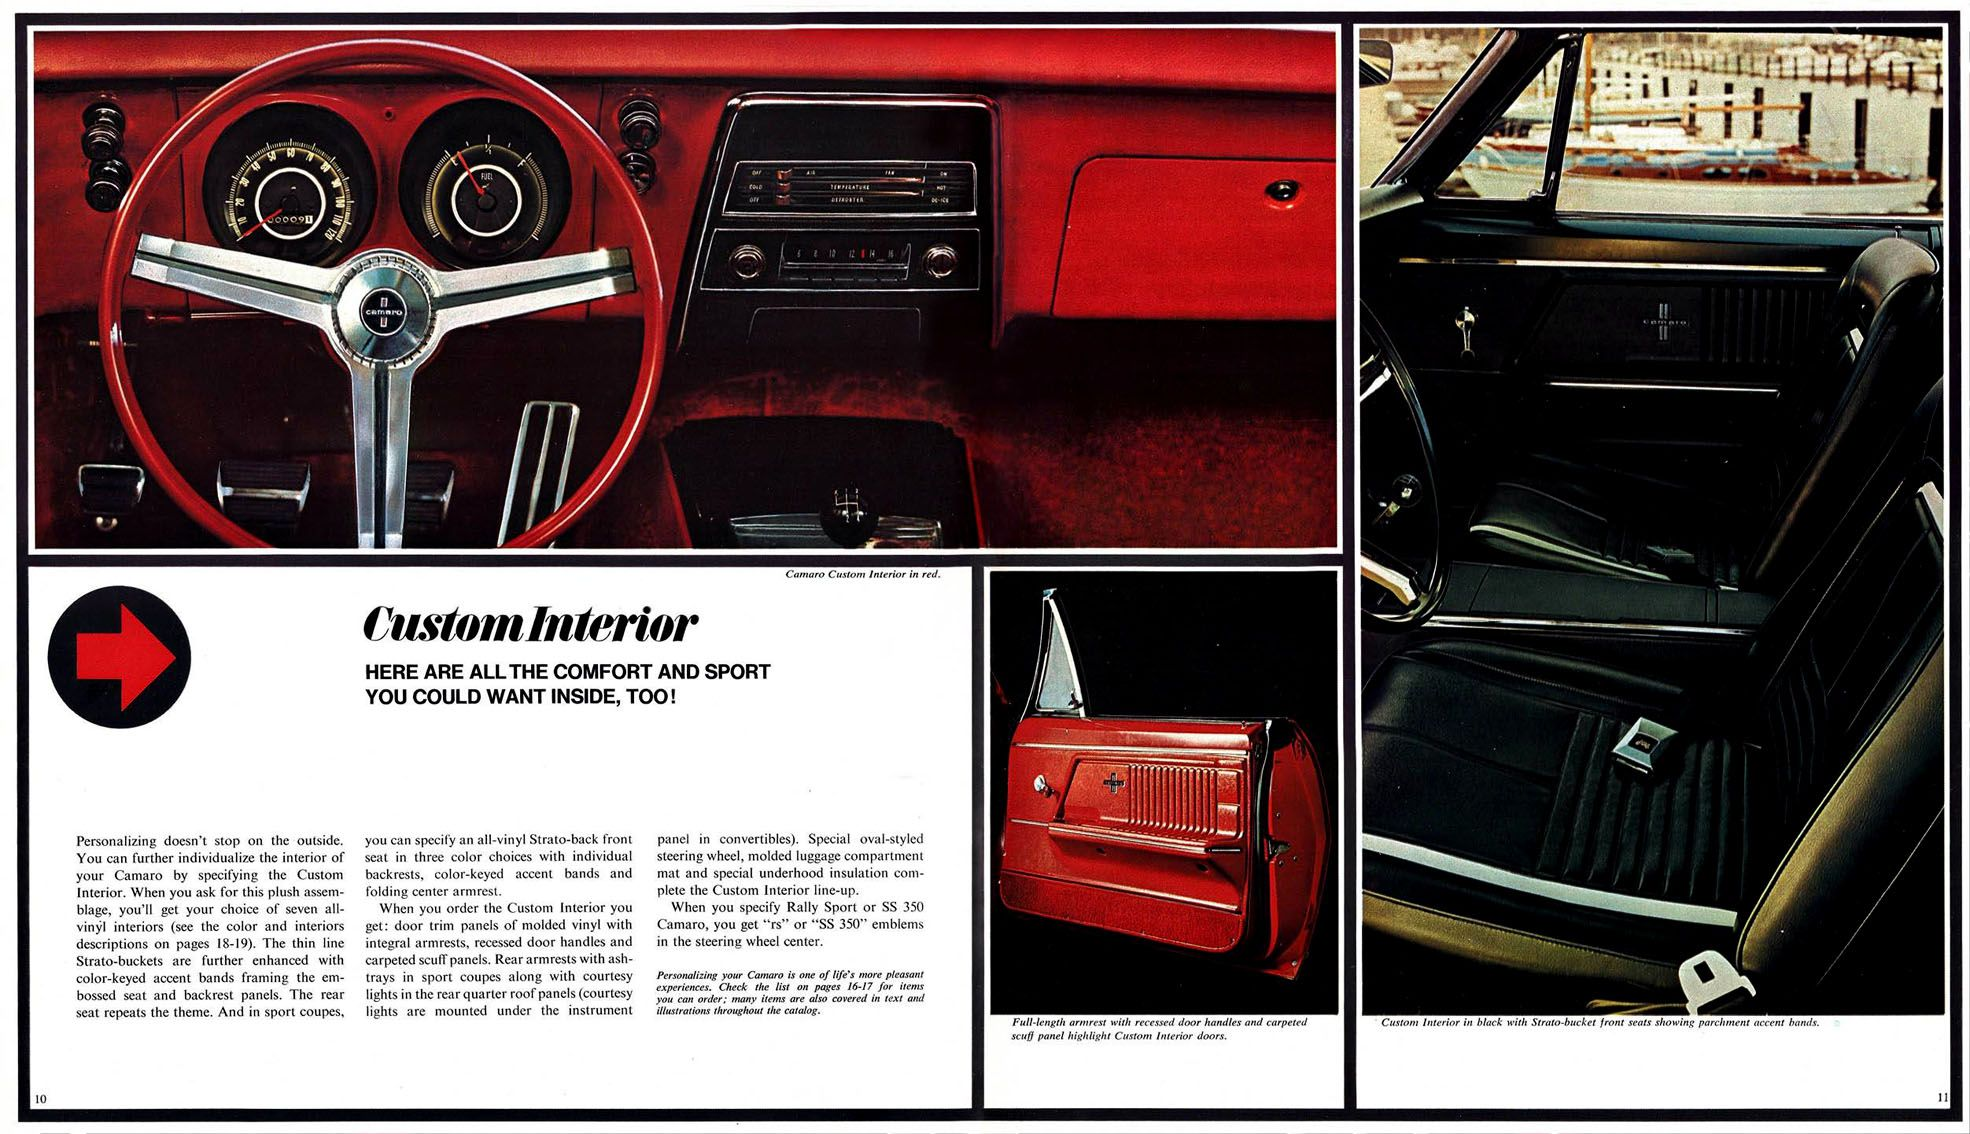 1967 chevrolet camaro interior the sixties pinterest chevrolet camaro chevrolet and 1967 camaro